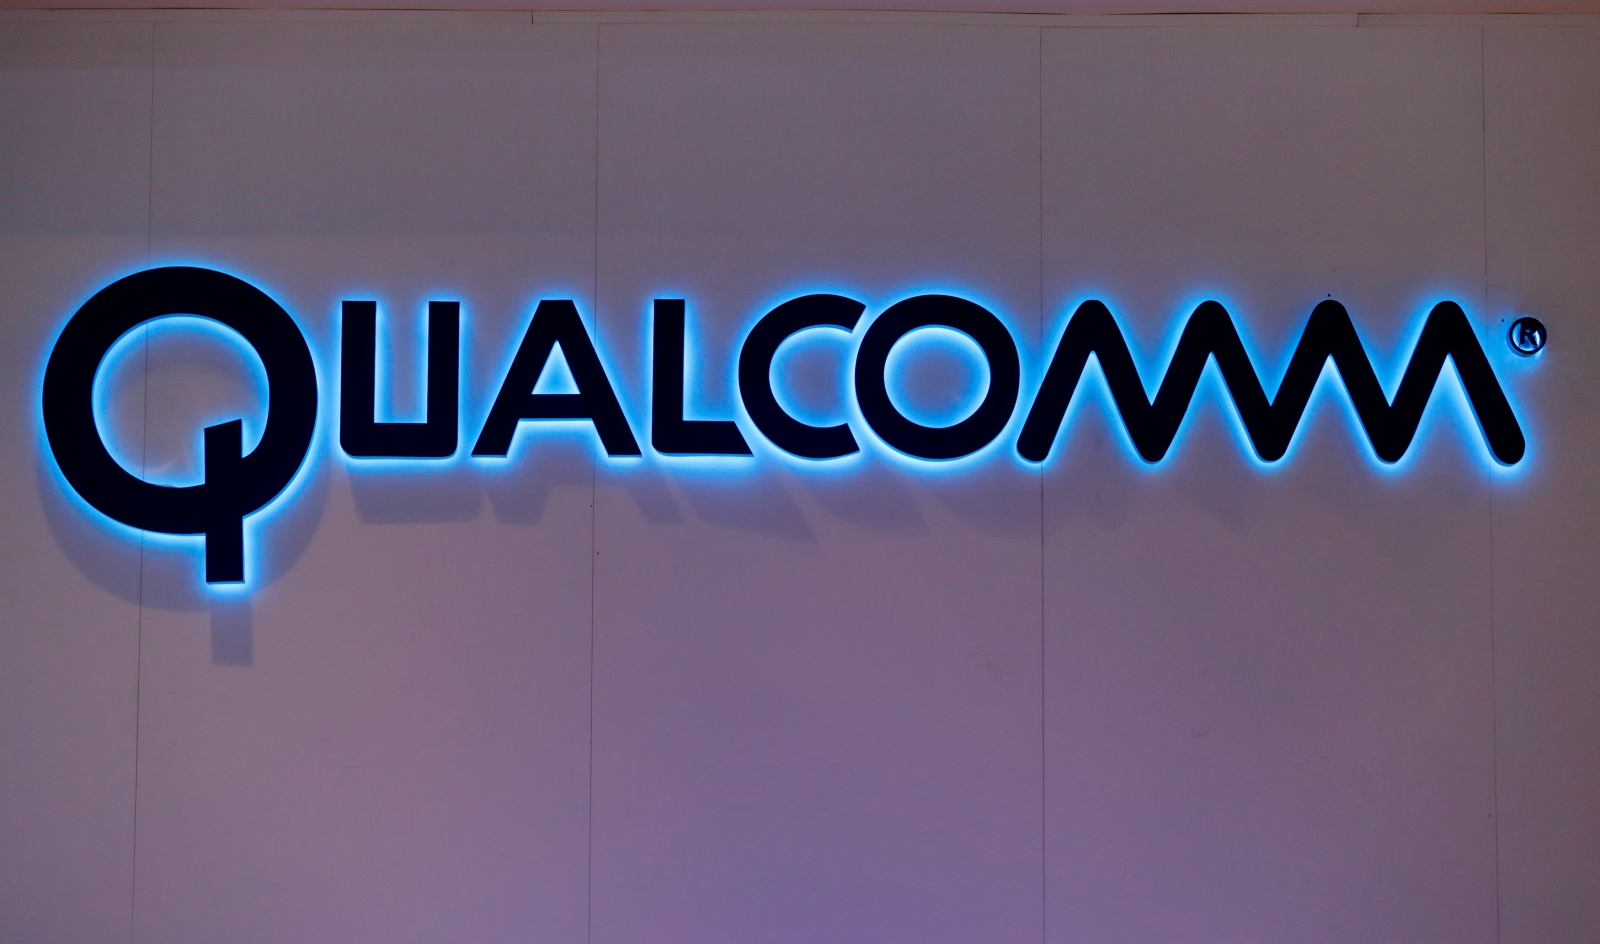 Qualcomm sues Apple over iPhone royalties